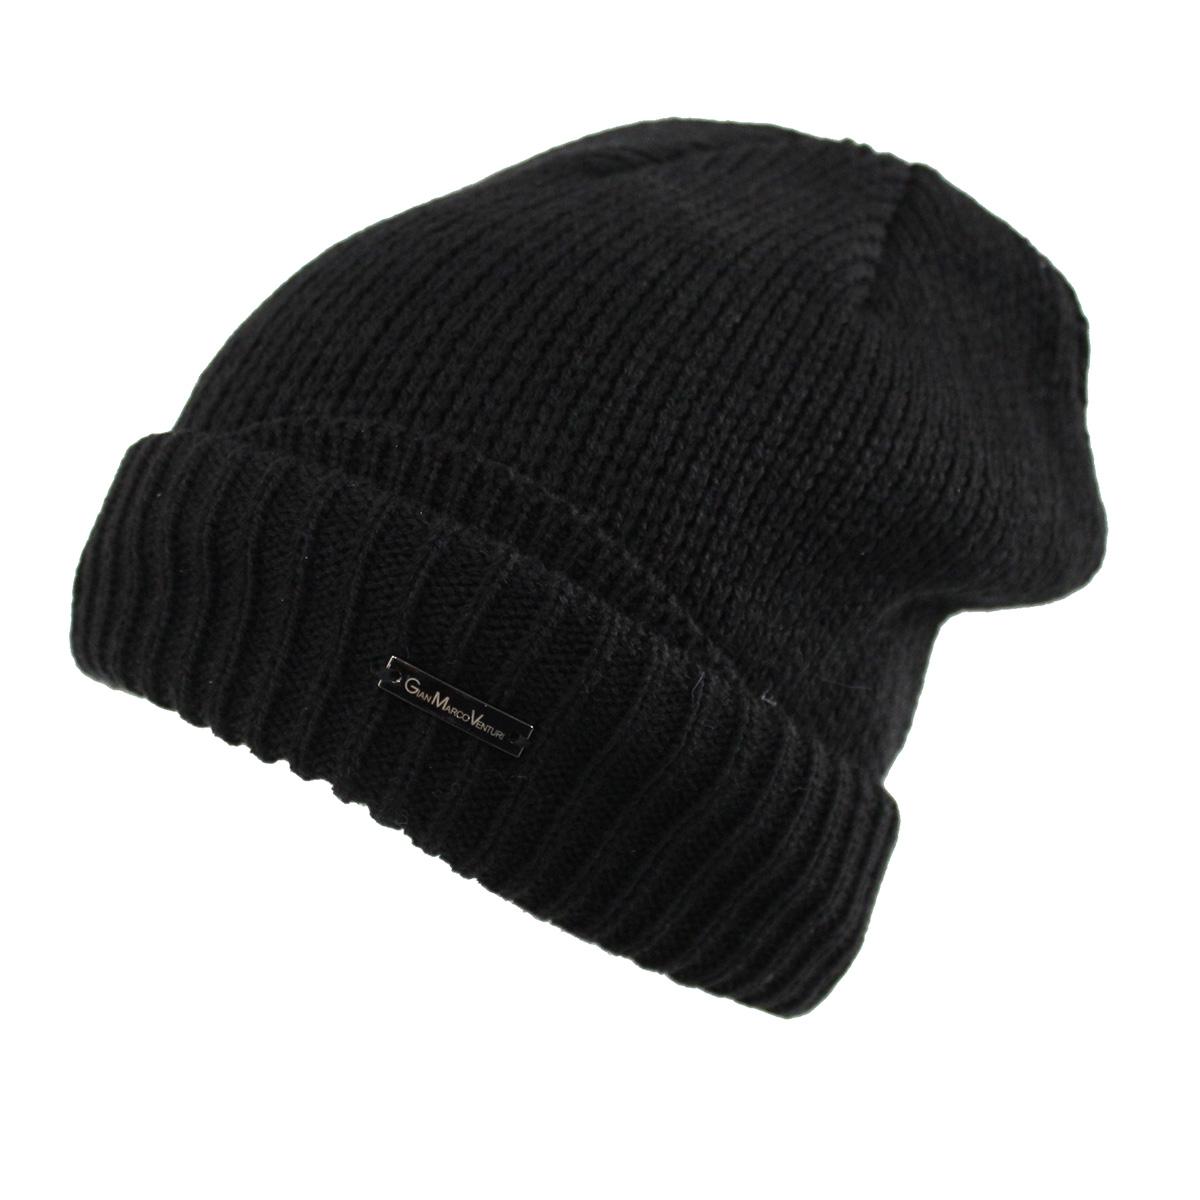 Men's hat 100% acrylic skipper with turn-up Gian Marco Venturi 71802 black